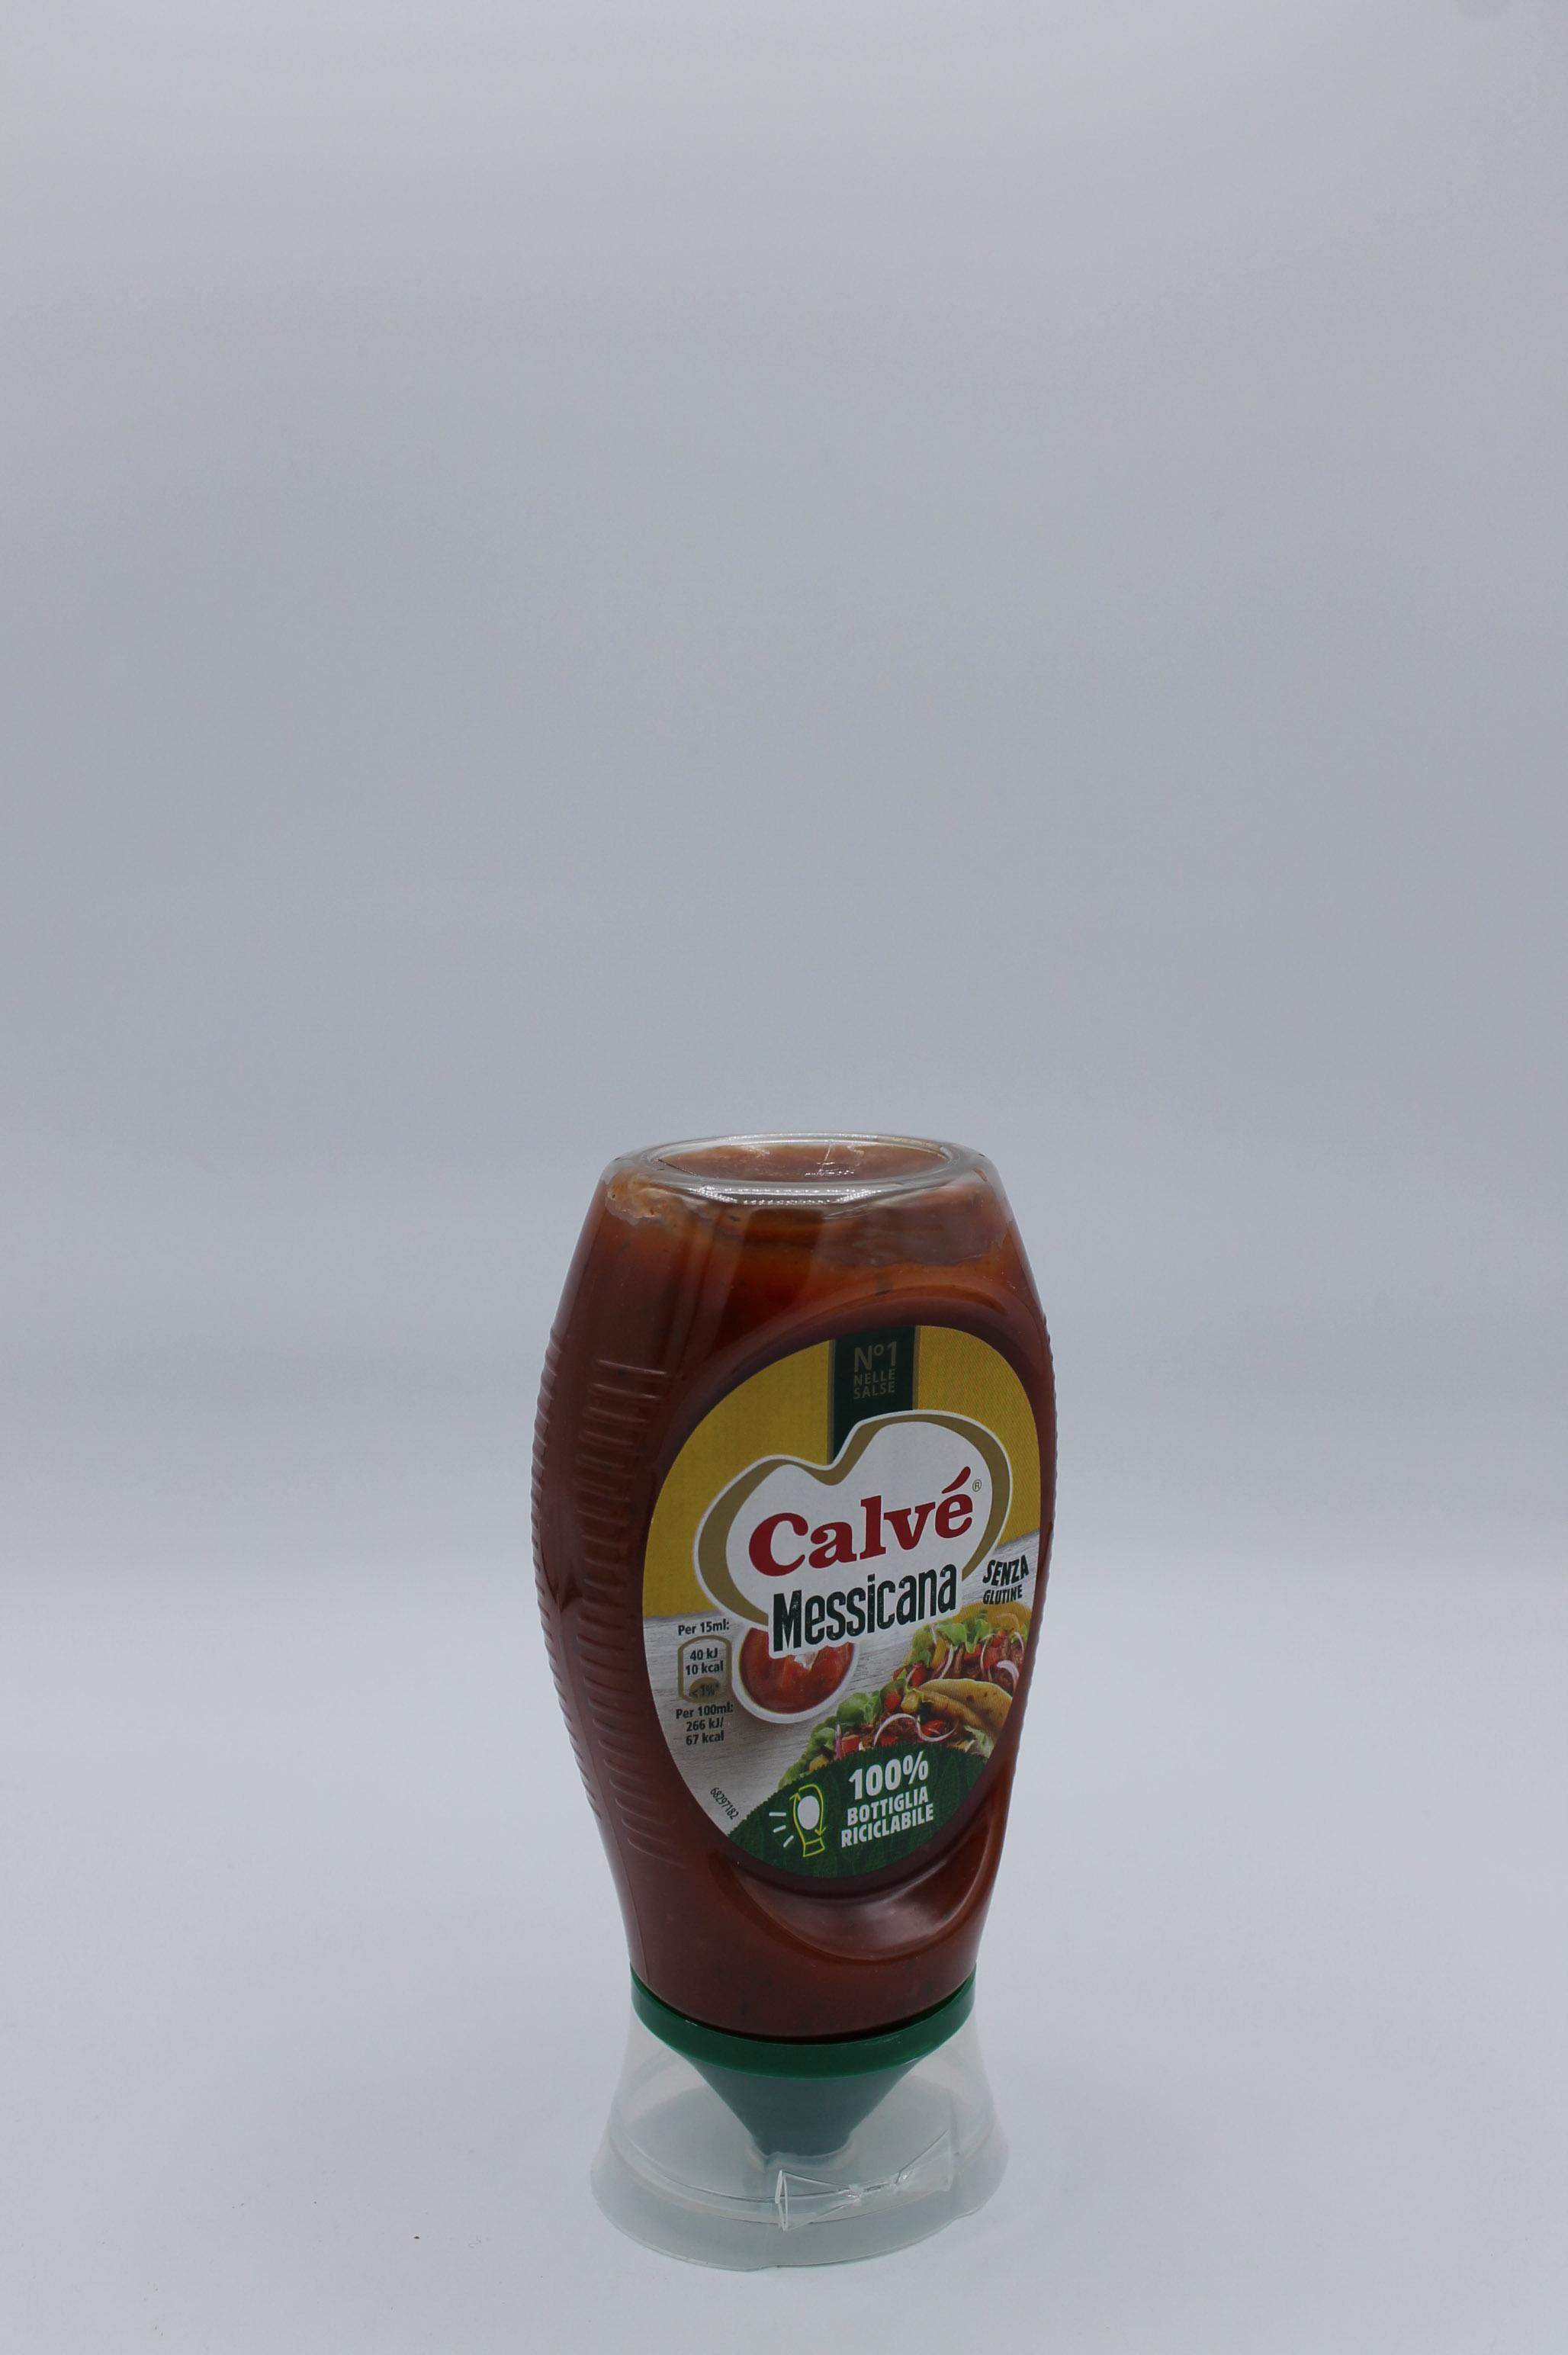 Calvè salsa messicana topdown 266 gr.